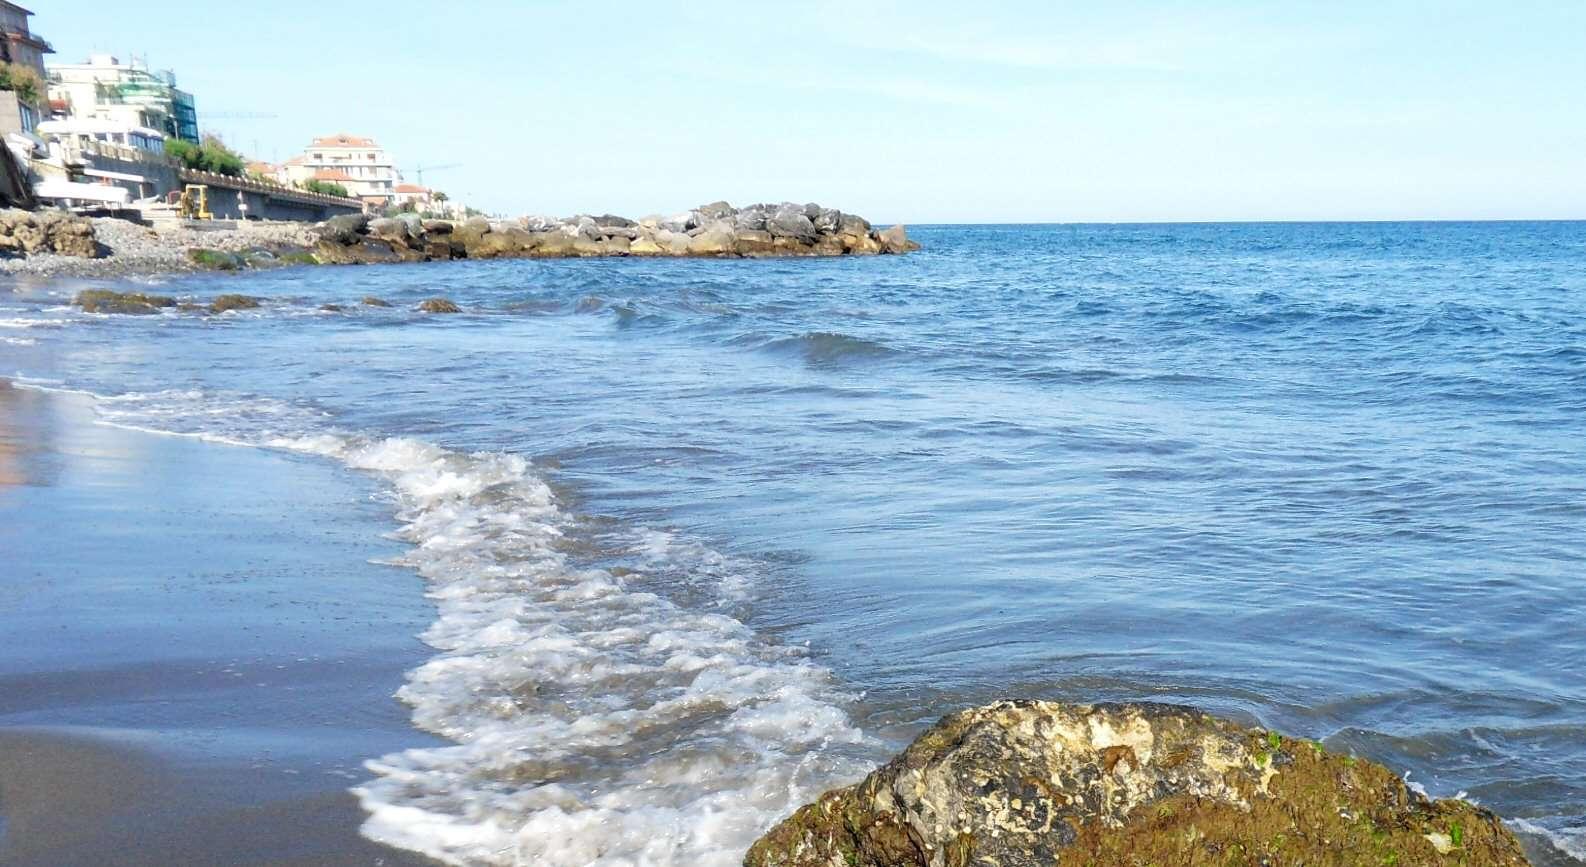 The beach nearby